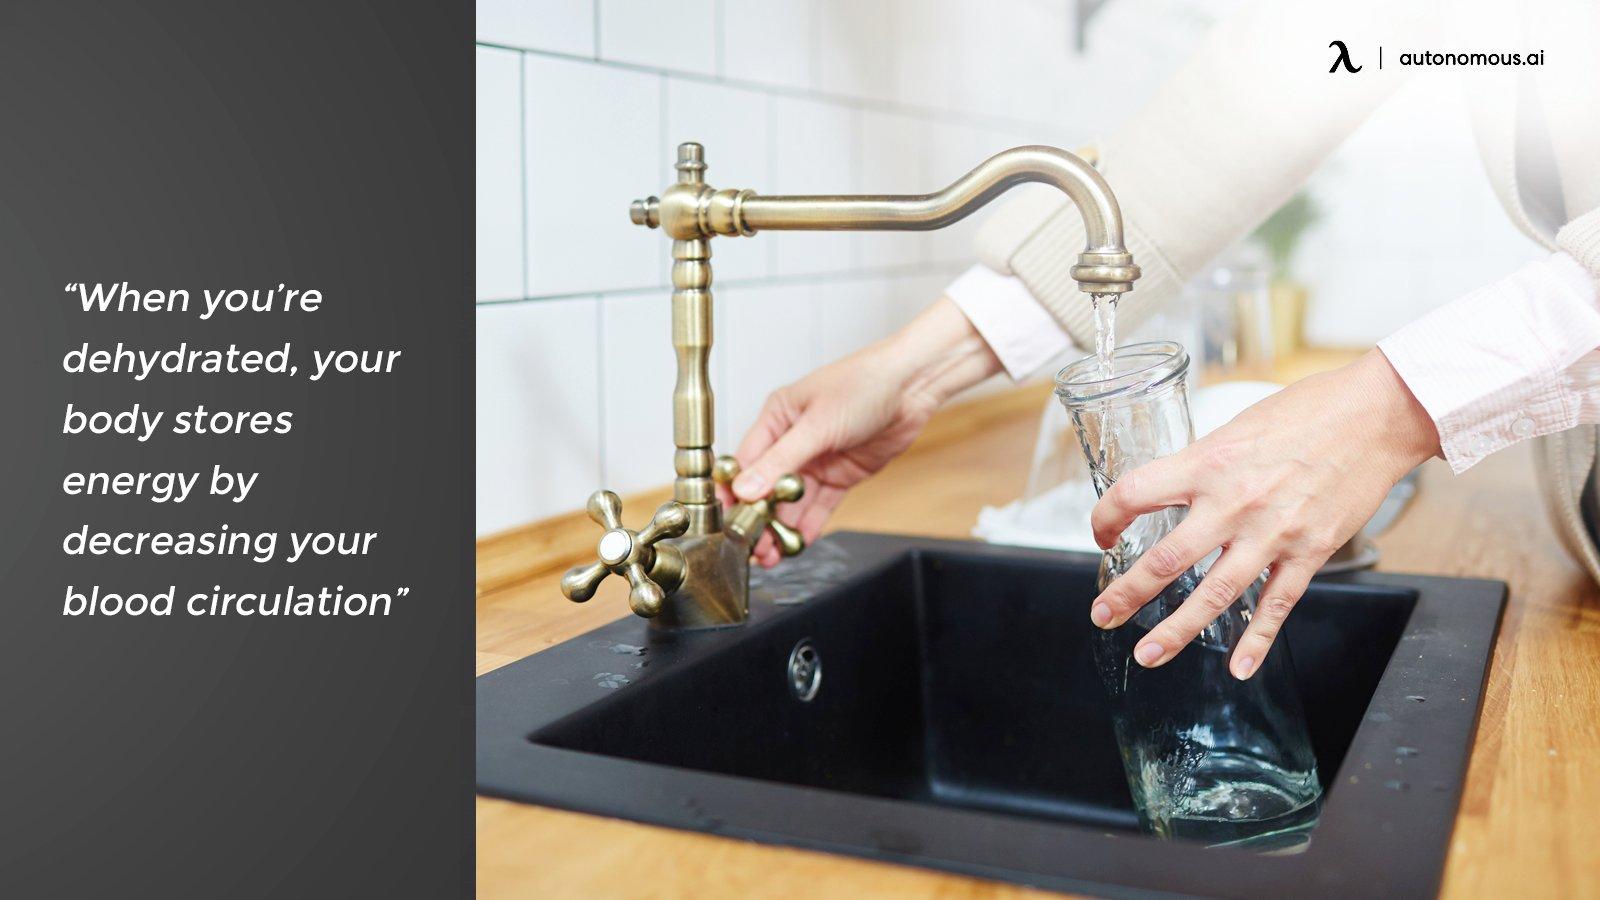 Dehydration and circulation